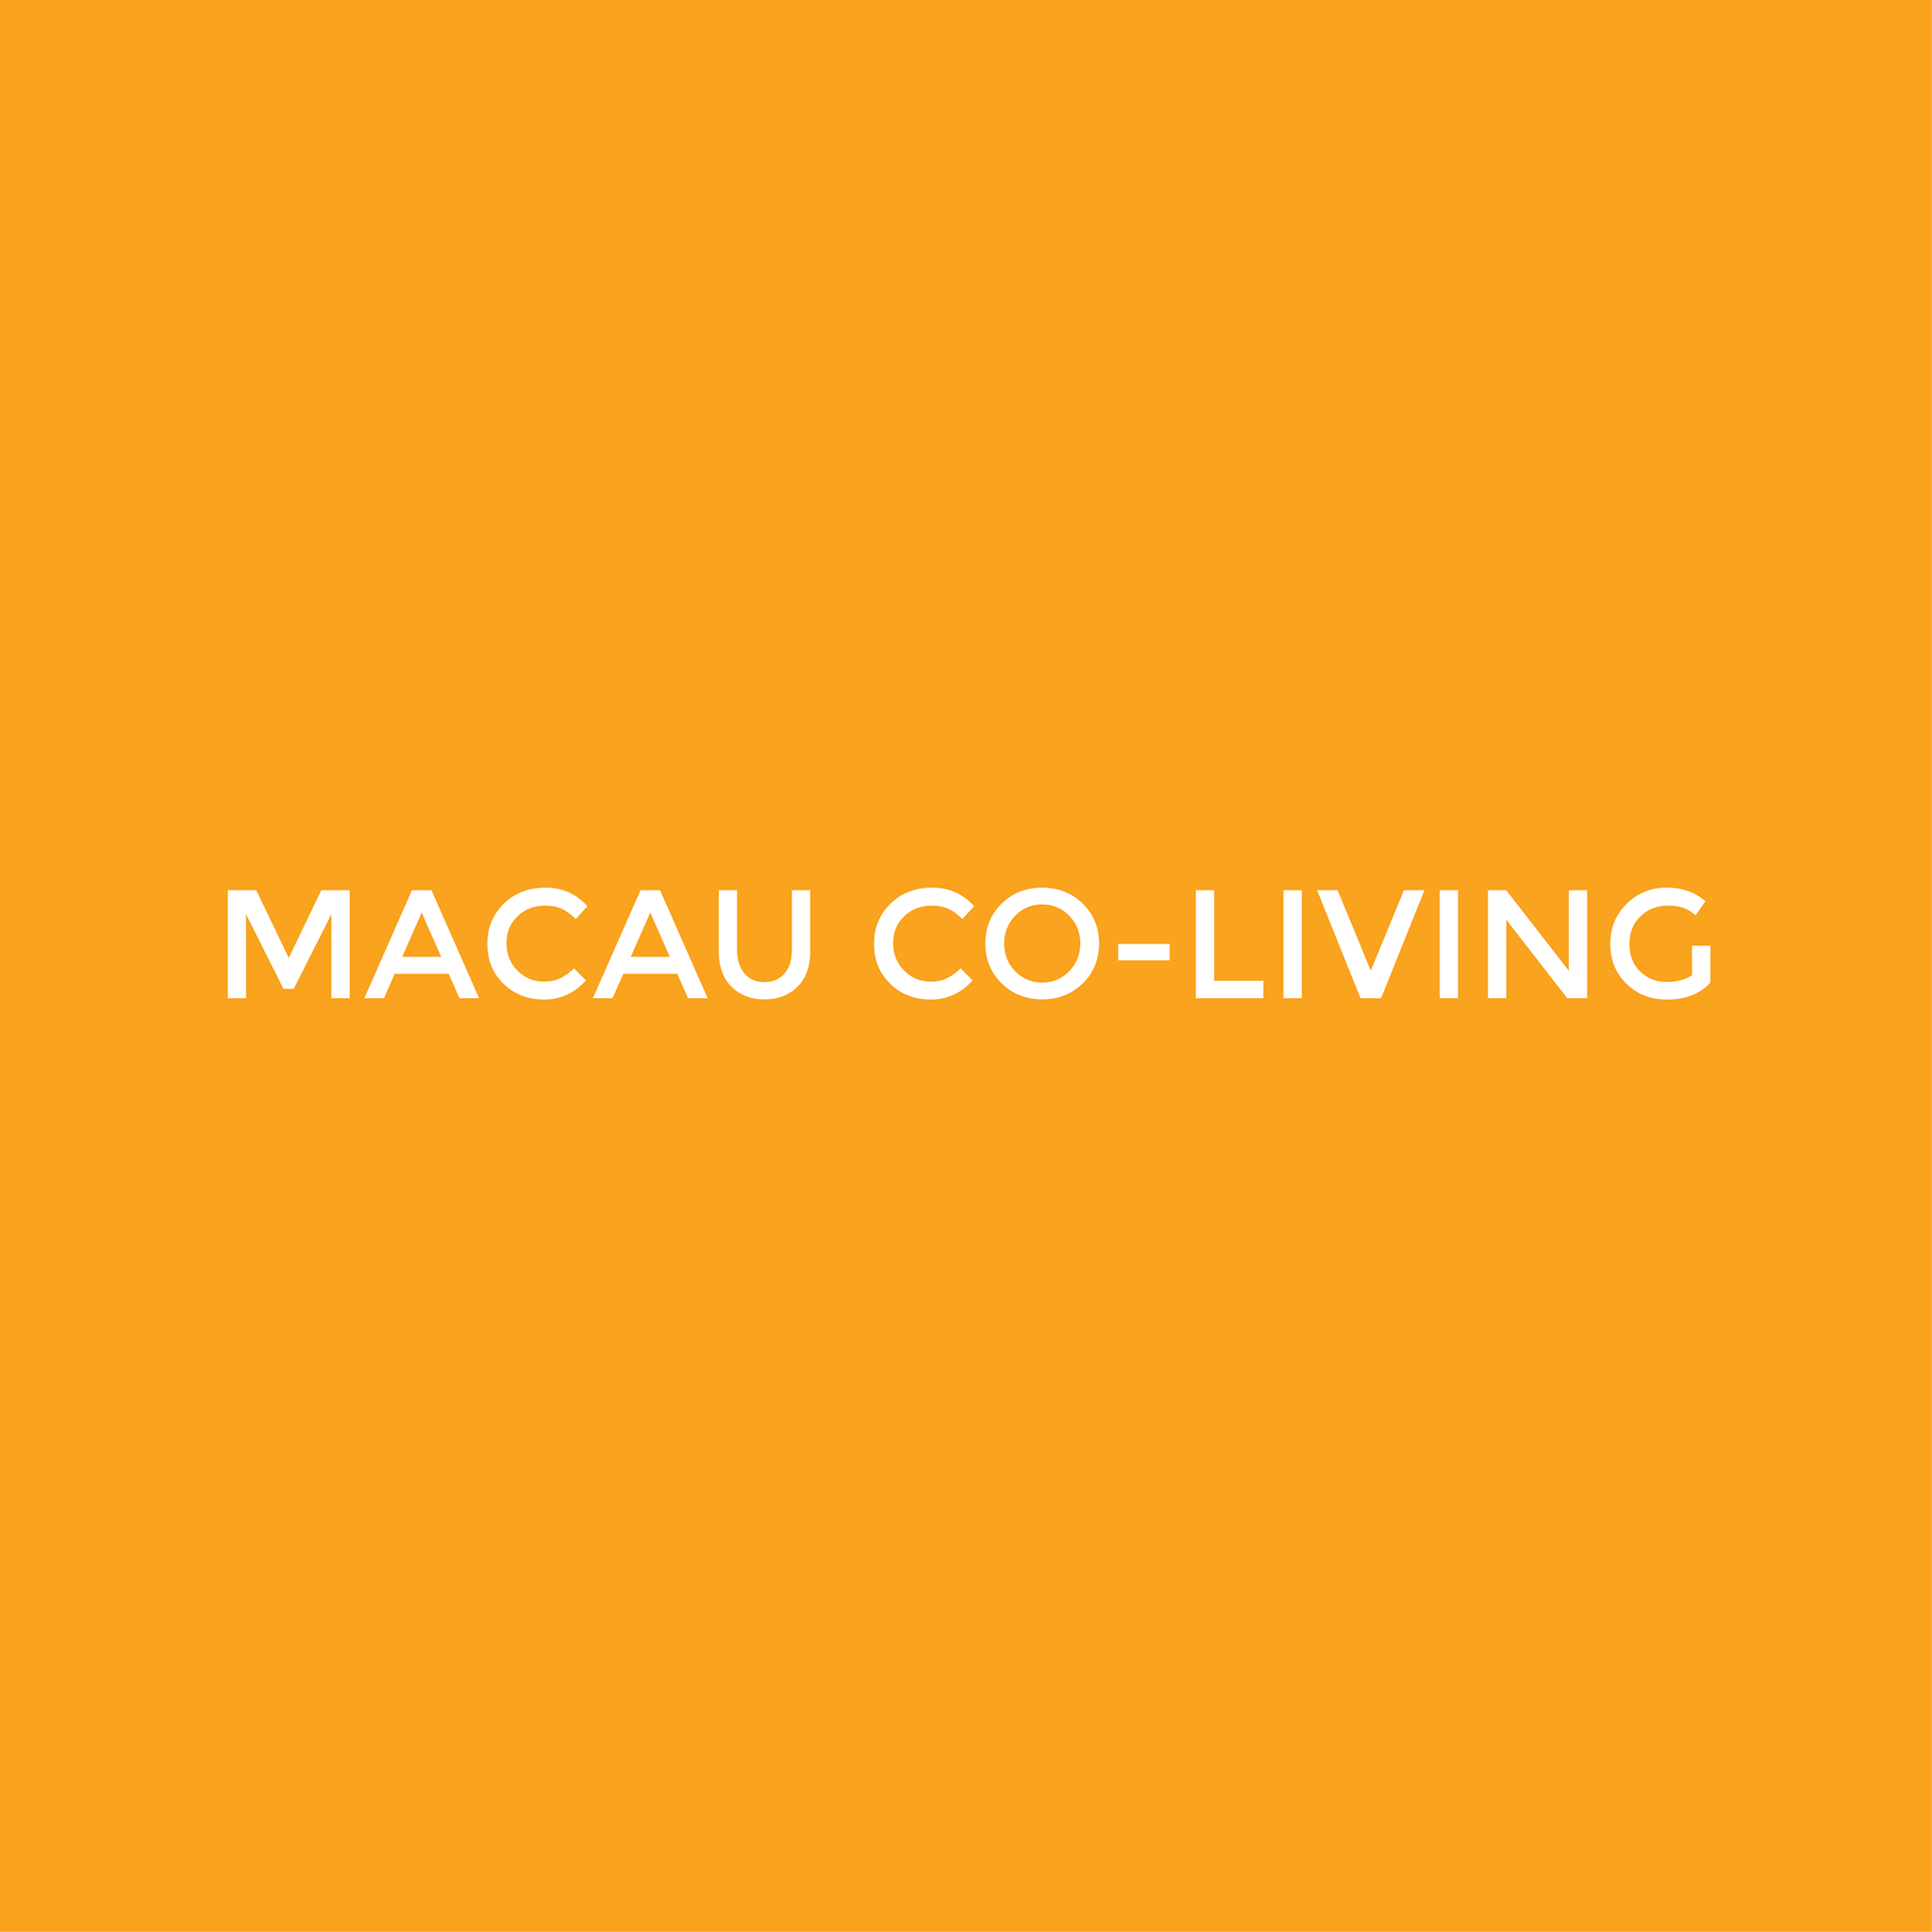 Macau Coliving